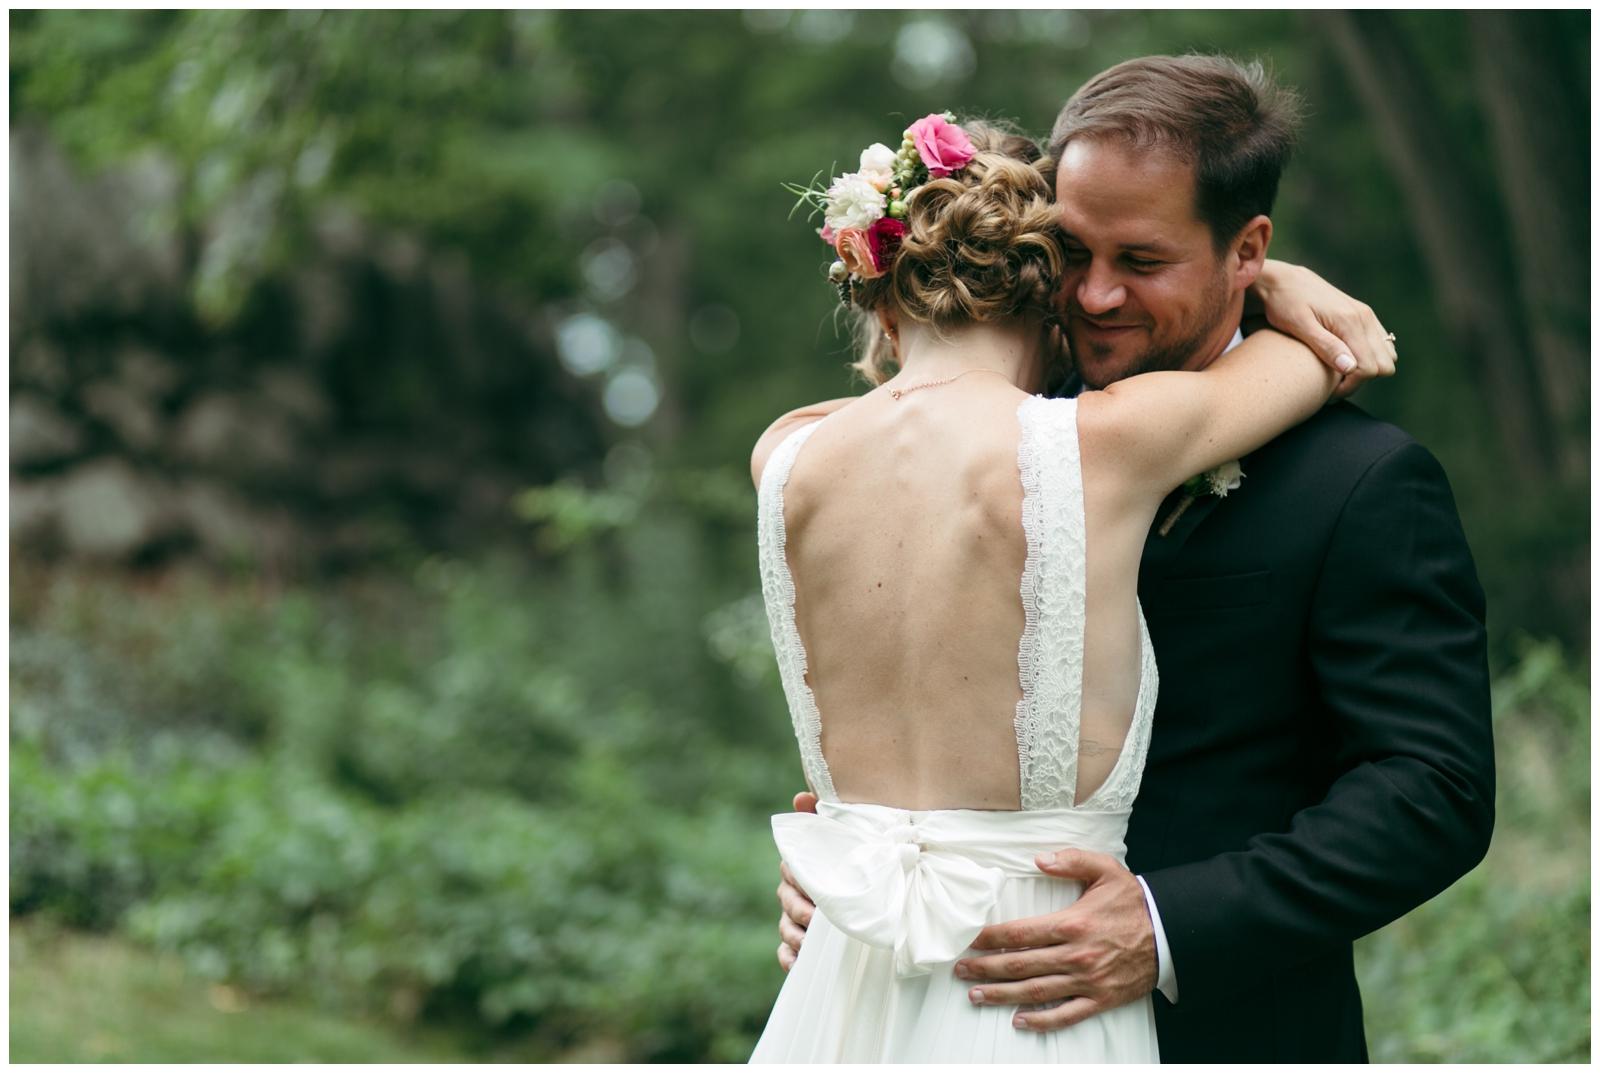 Moraine-Farm-wedding-Bailey-Q-Photo-Massachusetts-wedding-photpgrapher-030.jpg